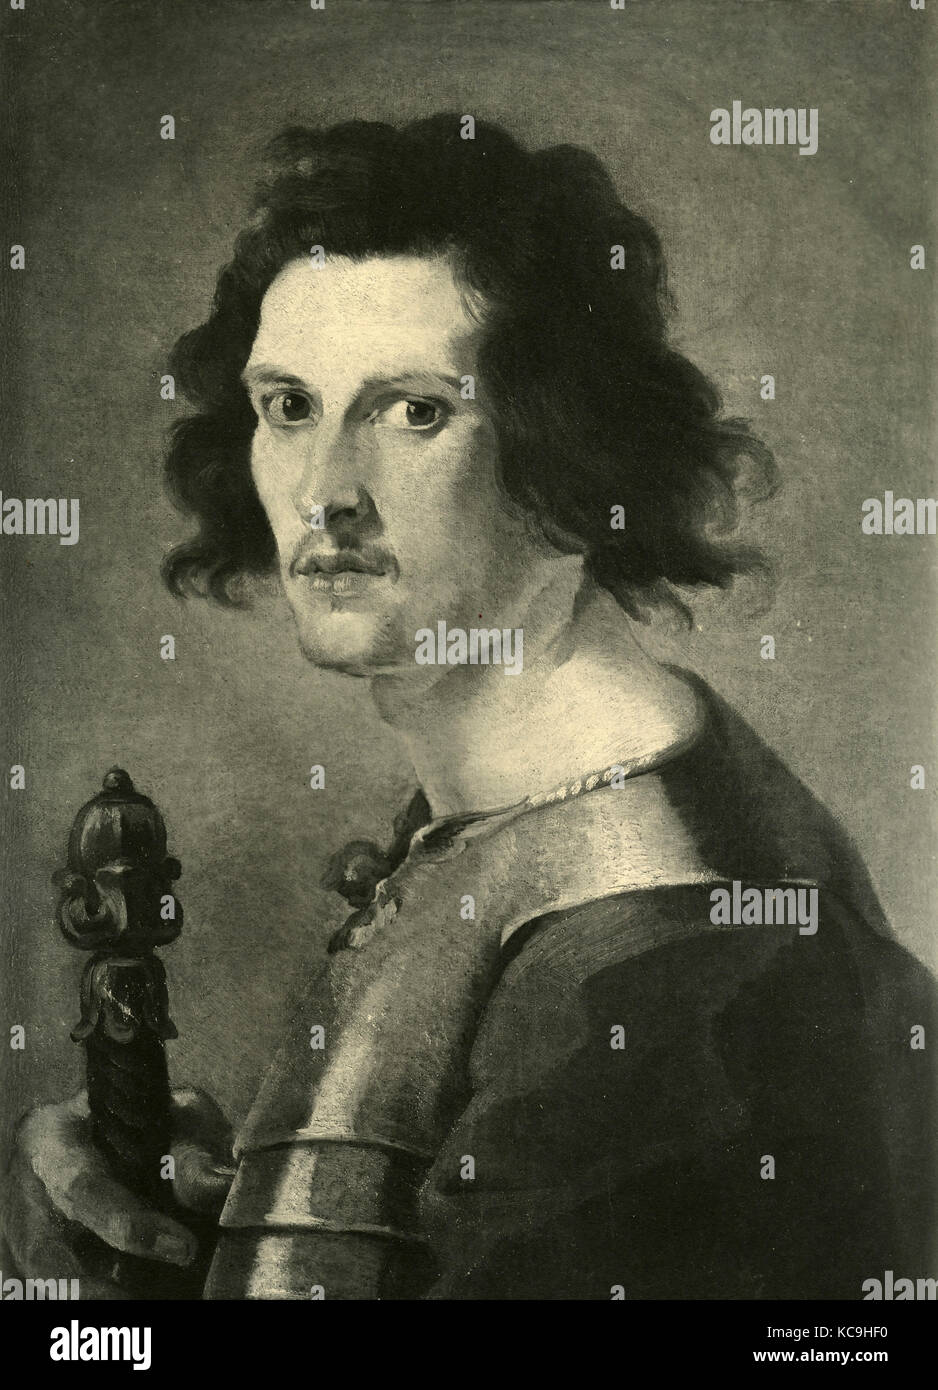 Gianlorenzo Bernini, self-portrait - Stock Image